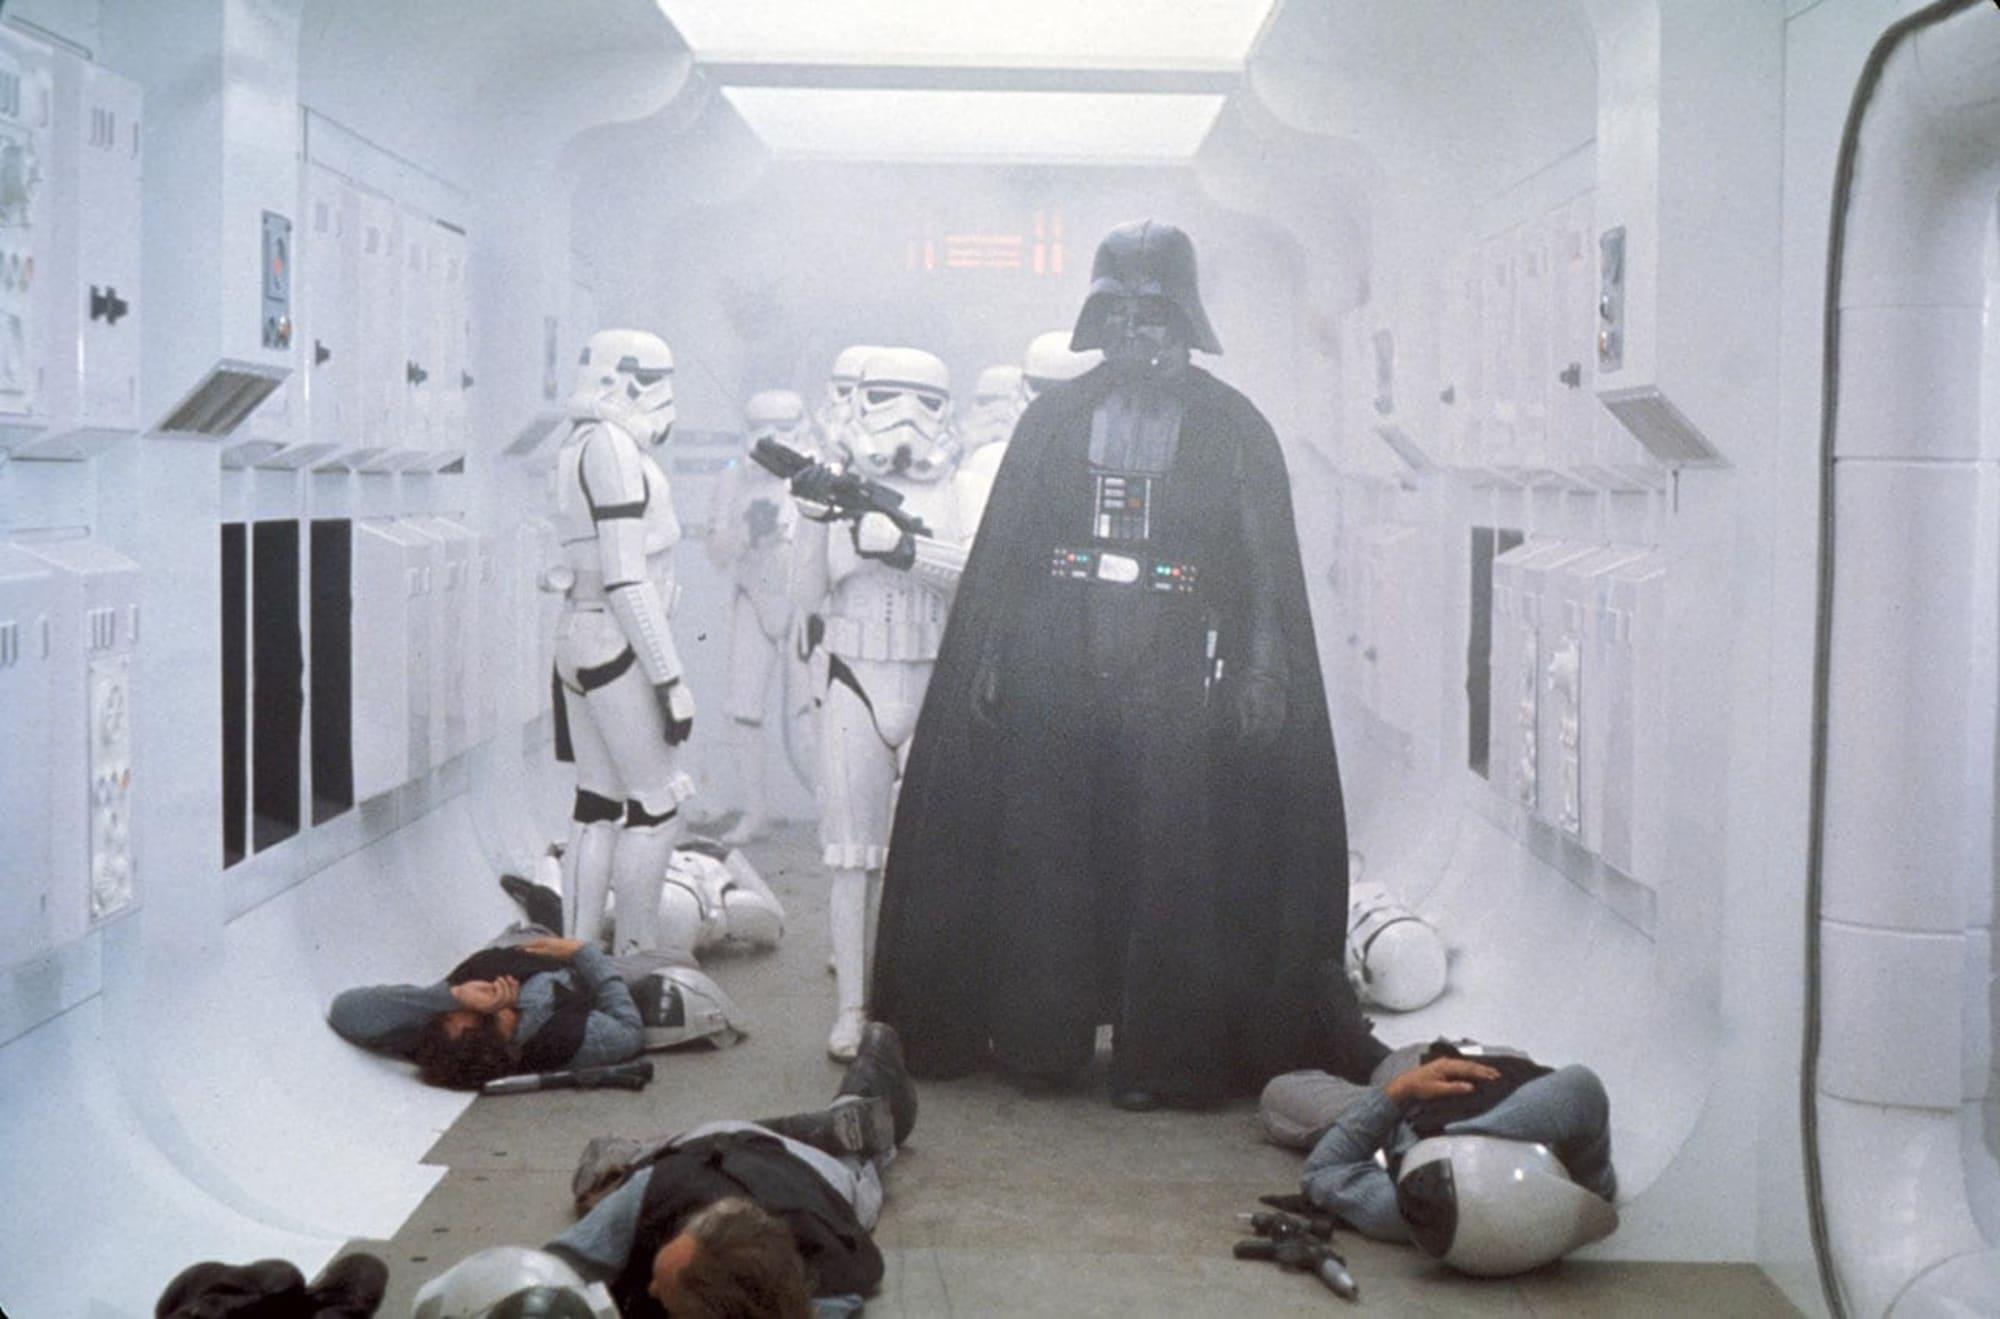 Actor Sung Kang hints at seeing Darth Vader on set of Obi-Wan Kenobi